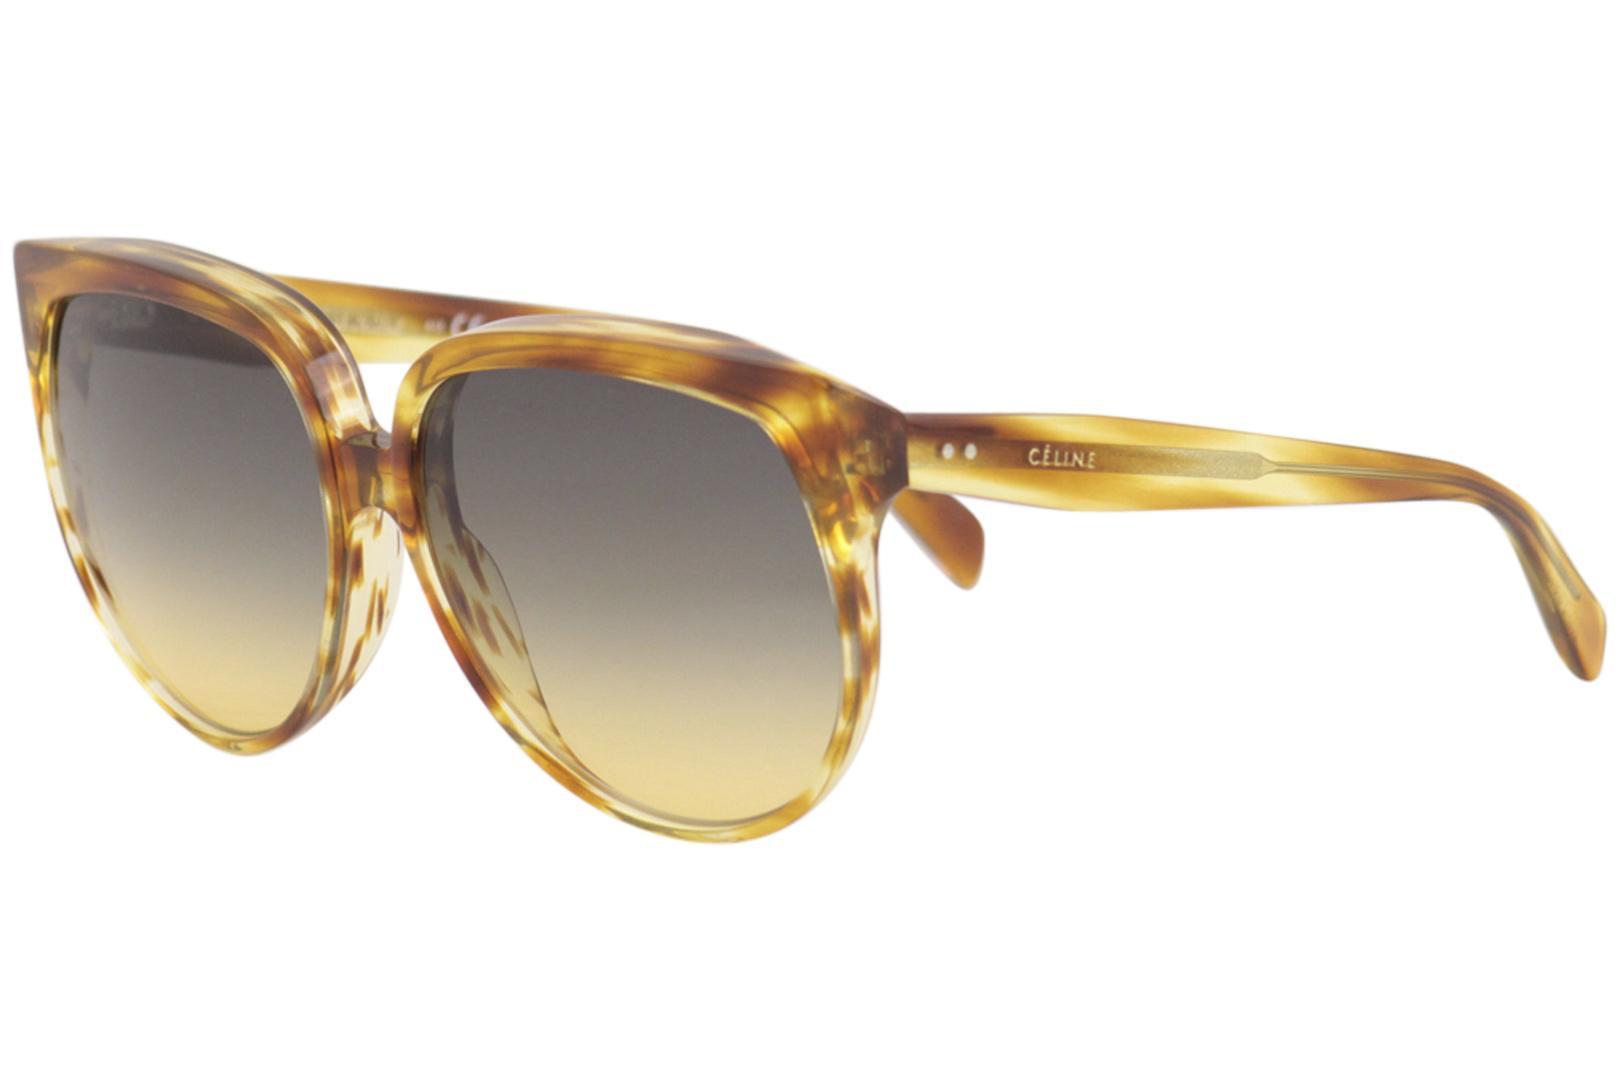 a5f5f7d3e78e Celine Women s CL40048I CL 40048 I Fashion Square Sunglasses